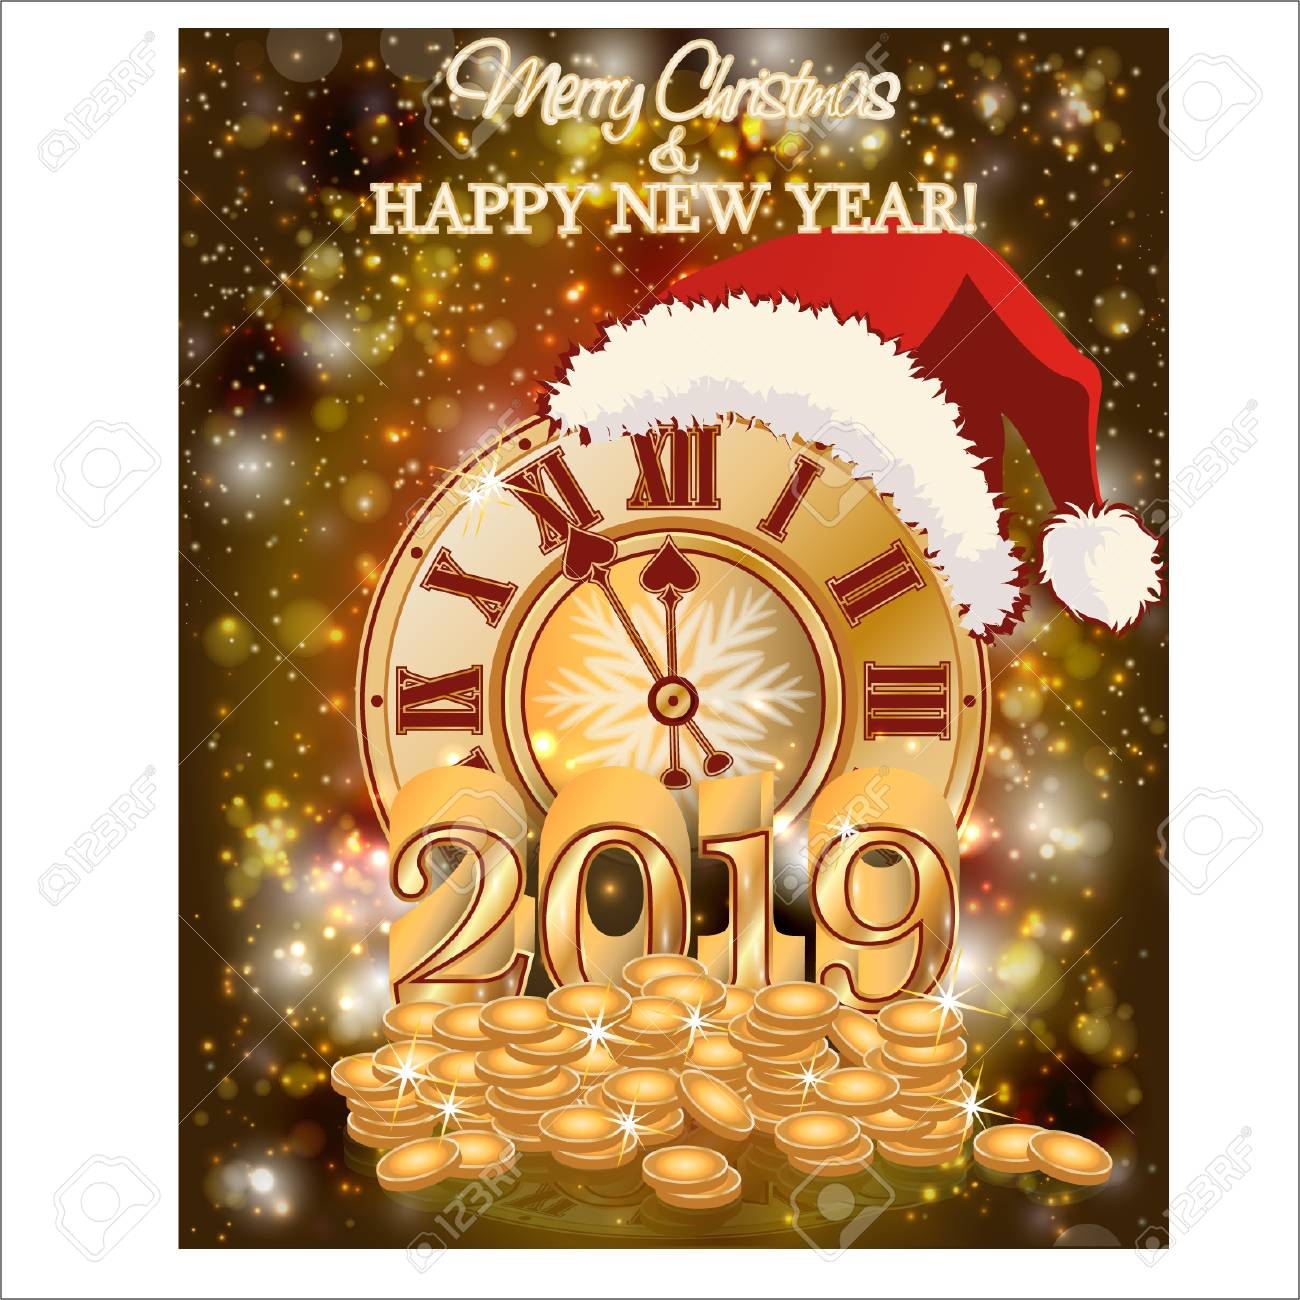 Happy New Year 2019 Wallpaper, Vector Illustration Royalty Free